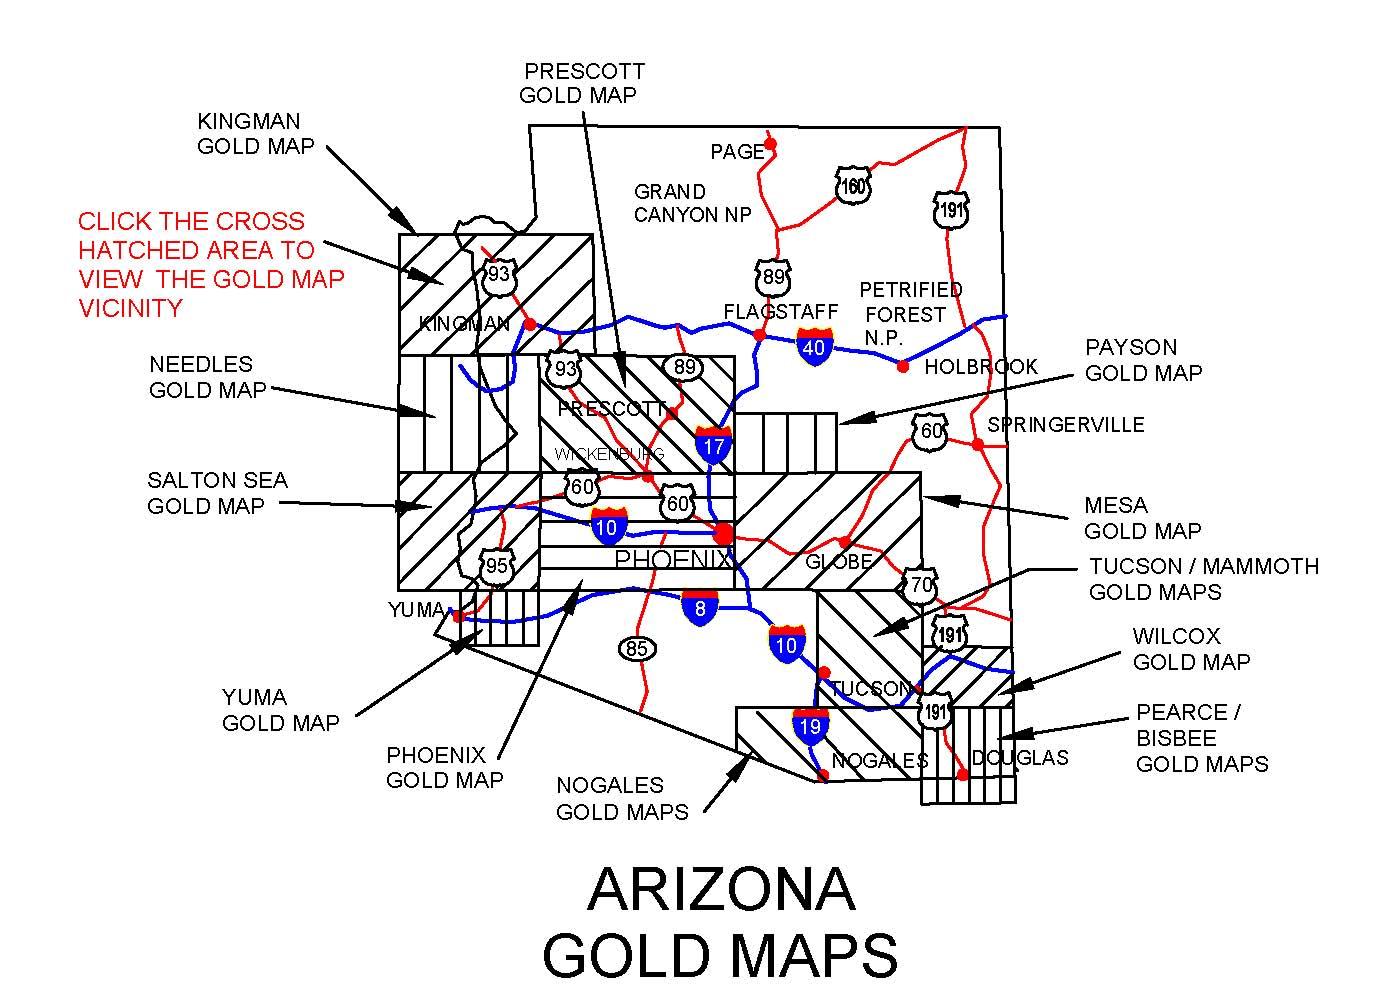 ARIZONA GOLD MAPS, ARIZONA GOLD PANNING, ARIZONA GOLD PLACERS ... on greasewood arizona map, mesquite arizona map, reno arizona map, las cruces arizona map, skywalk arizona map, durango arizona map, wupatki national monument arizona map, route 66 arizona map, tucson map, havasu city arizona map, klondyke arizona map, humboldt arizona map, boise arizona map, golden valley arizona map, santa fe arizona map, needles california map, mohave county arizona map, two guns arizona map, phoenix map, las vegas map,